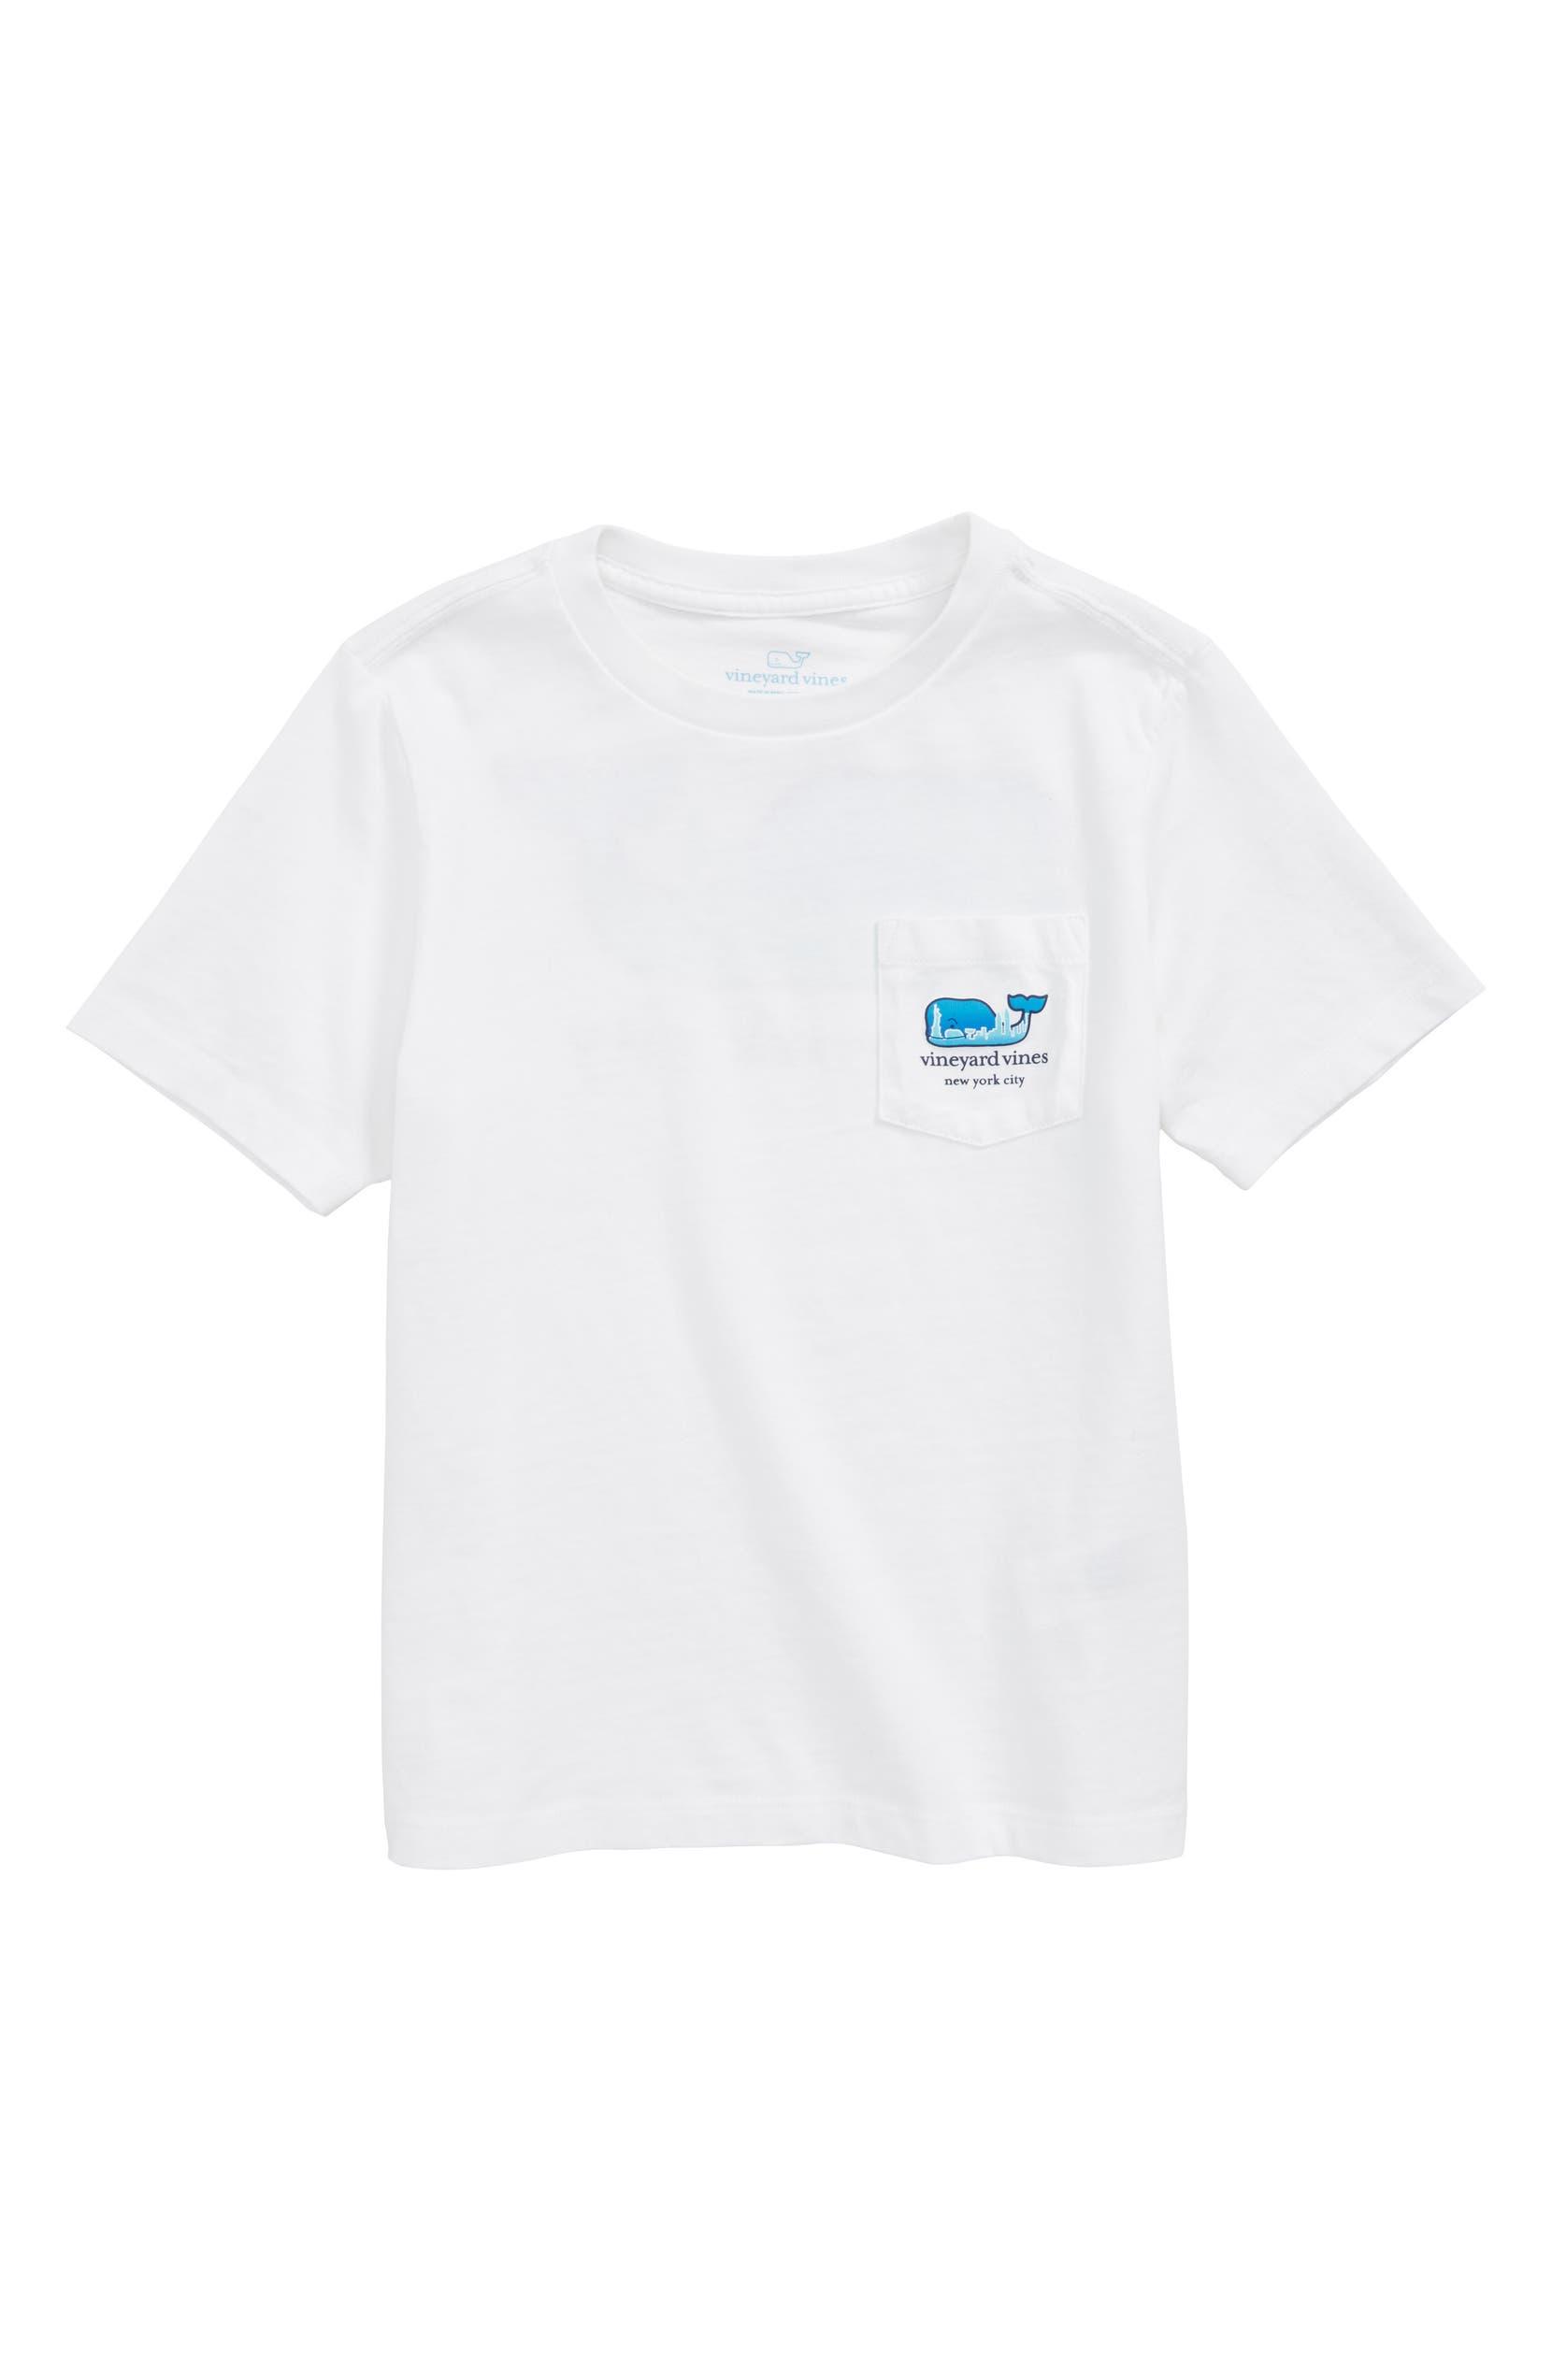 Vineyard Vines New York City Whale Pocket T Shirt Toddler Boys